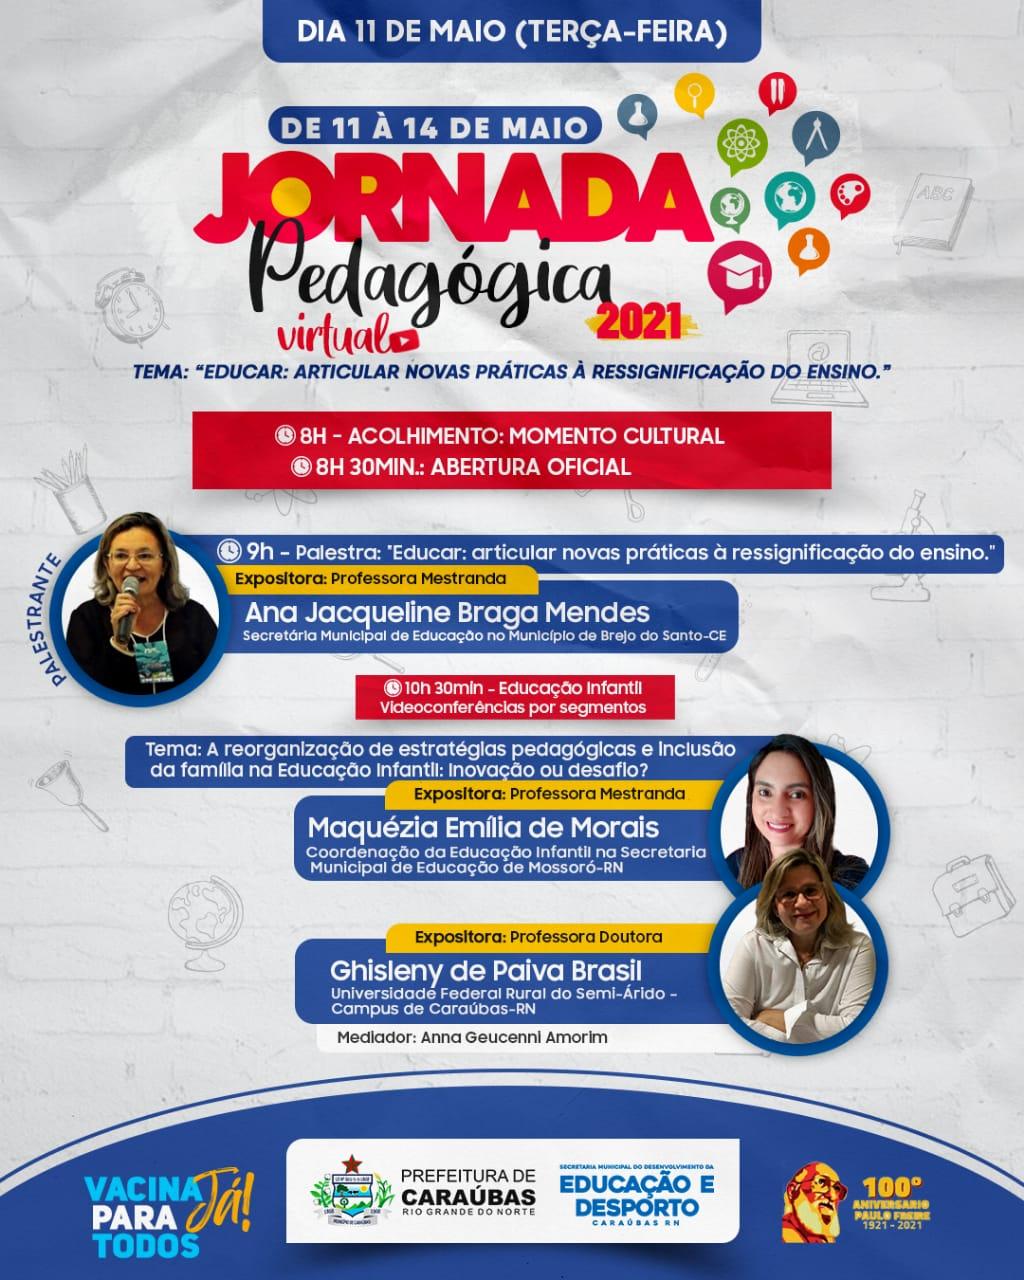 Jornada Pedagógica 2021 em Caraúbas será online